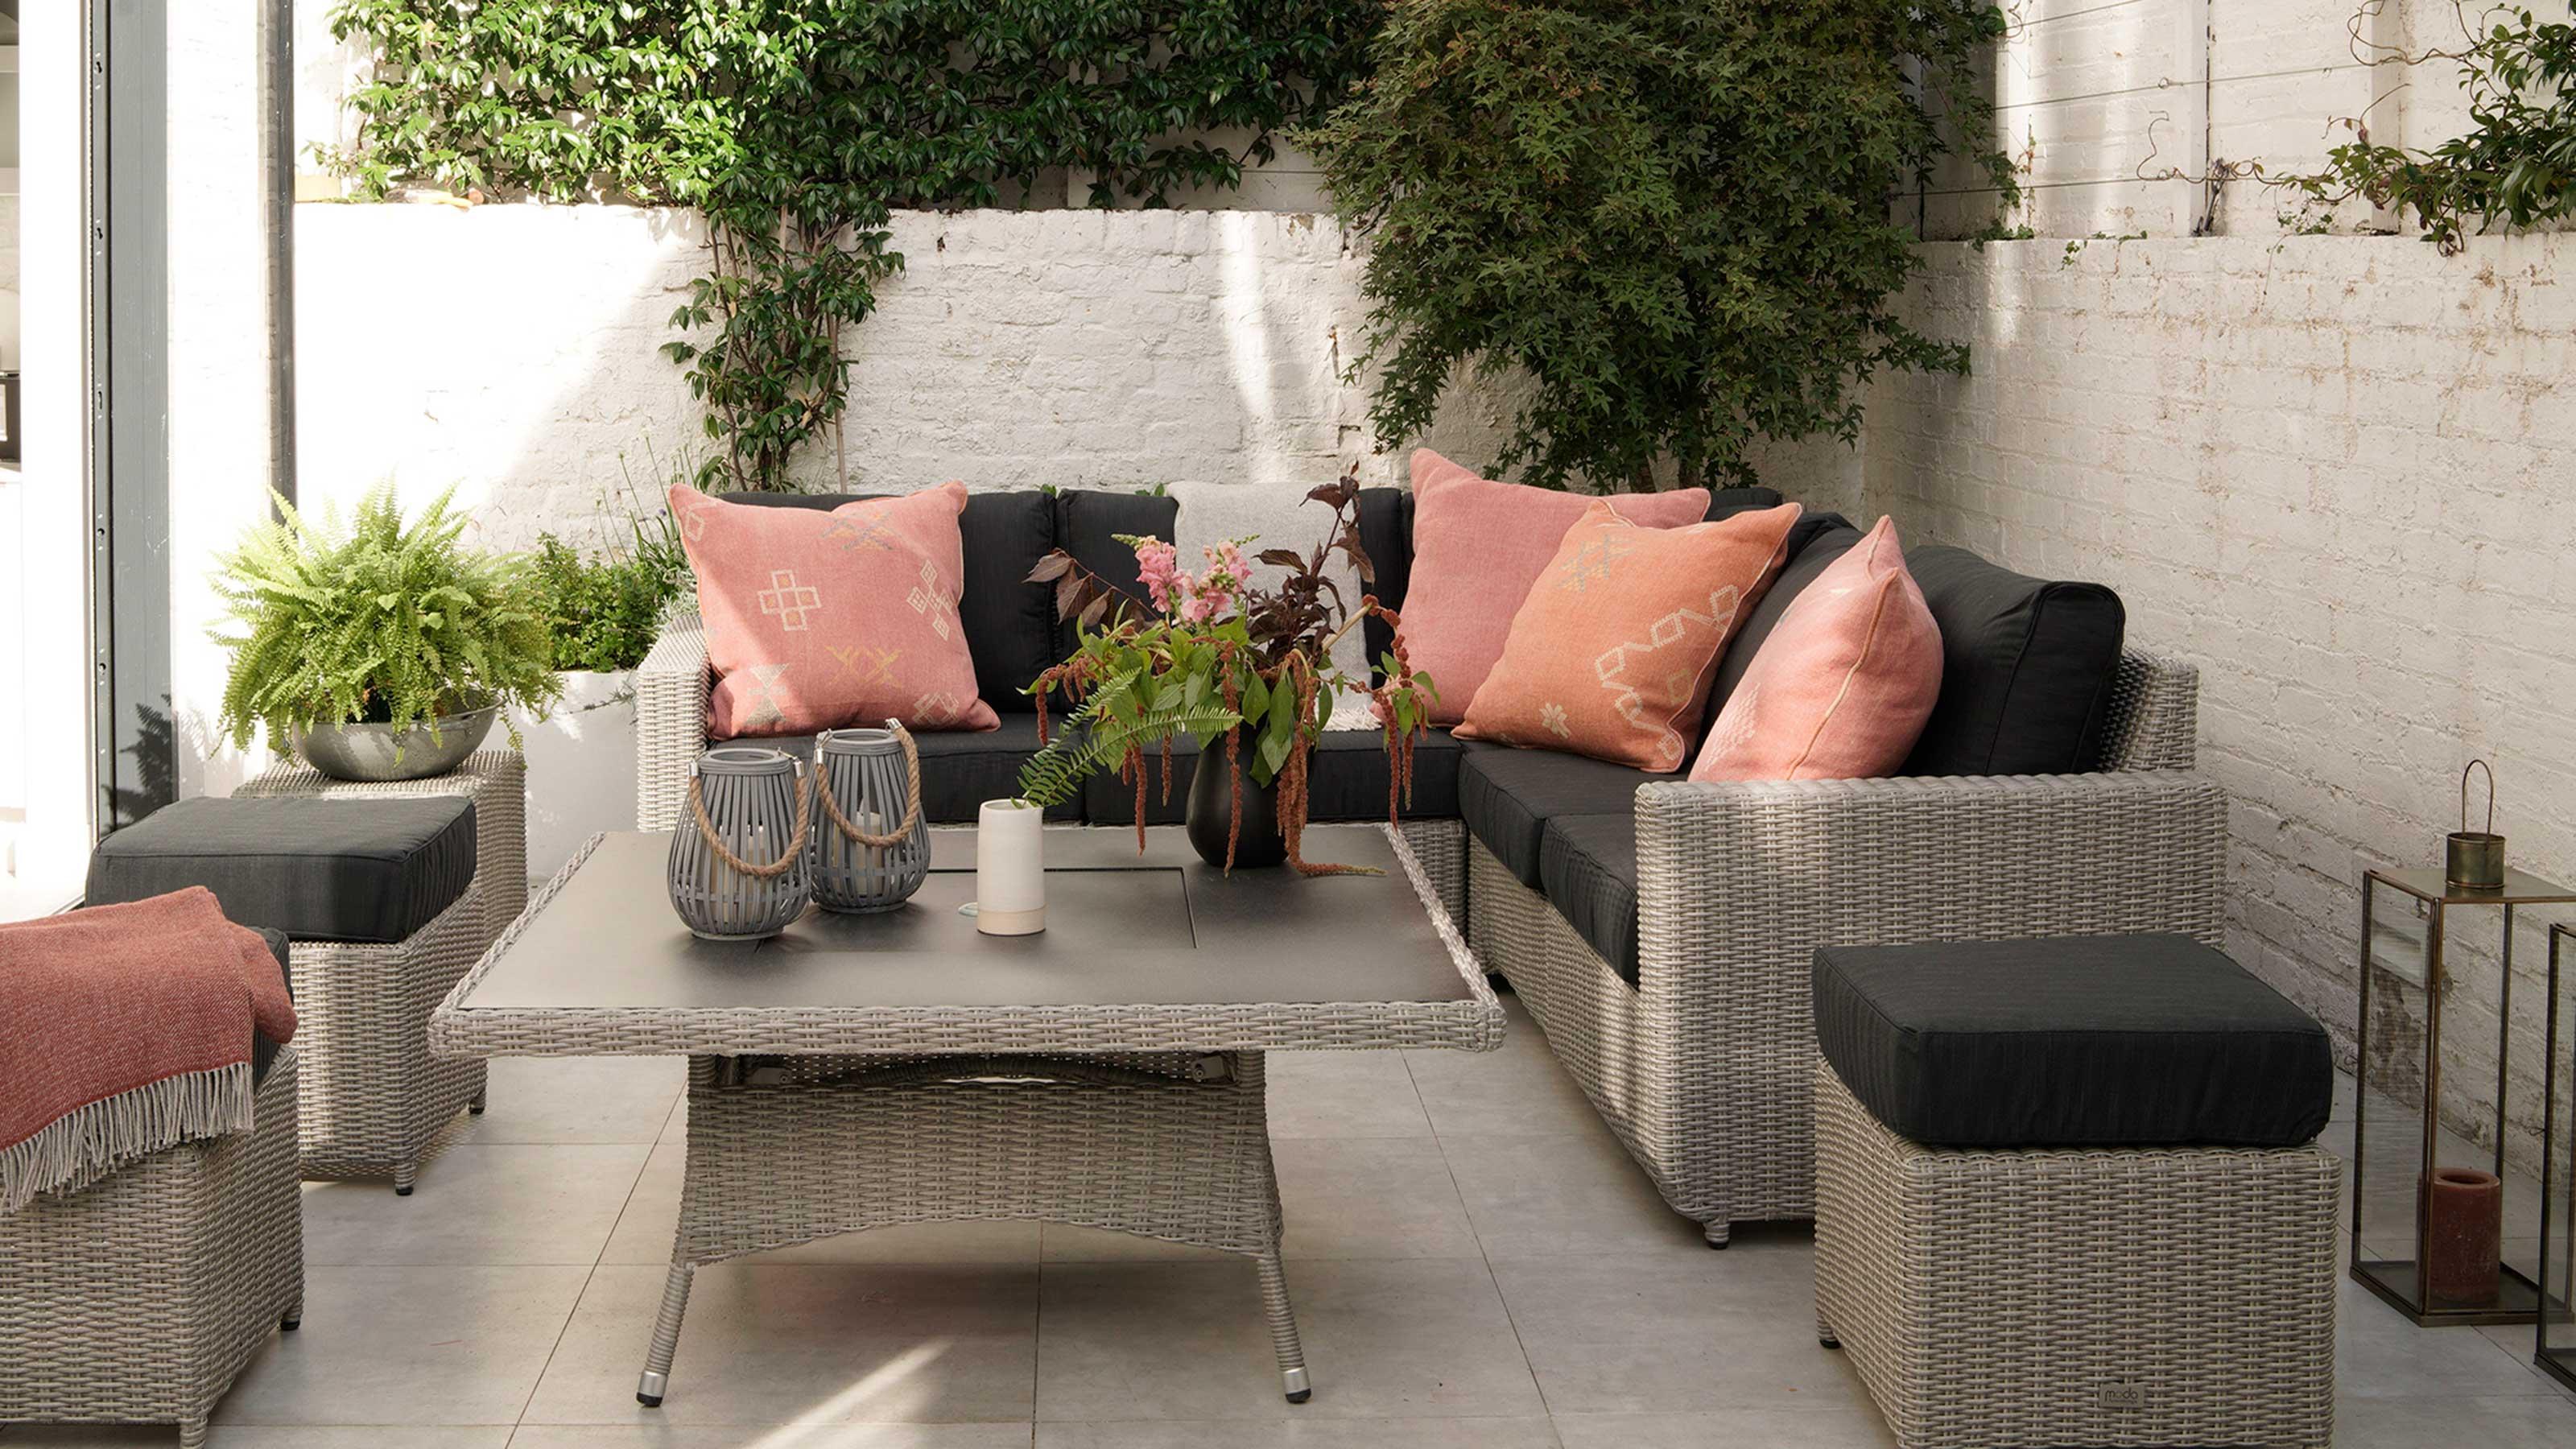 Courtyard garden ideas 20 stunning ways to transform small ...